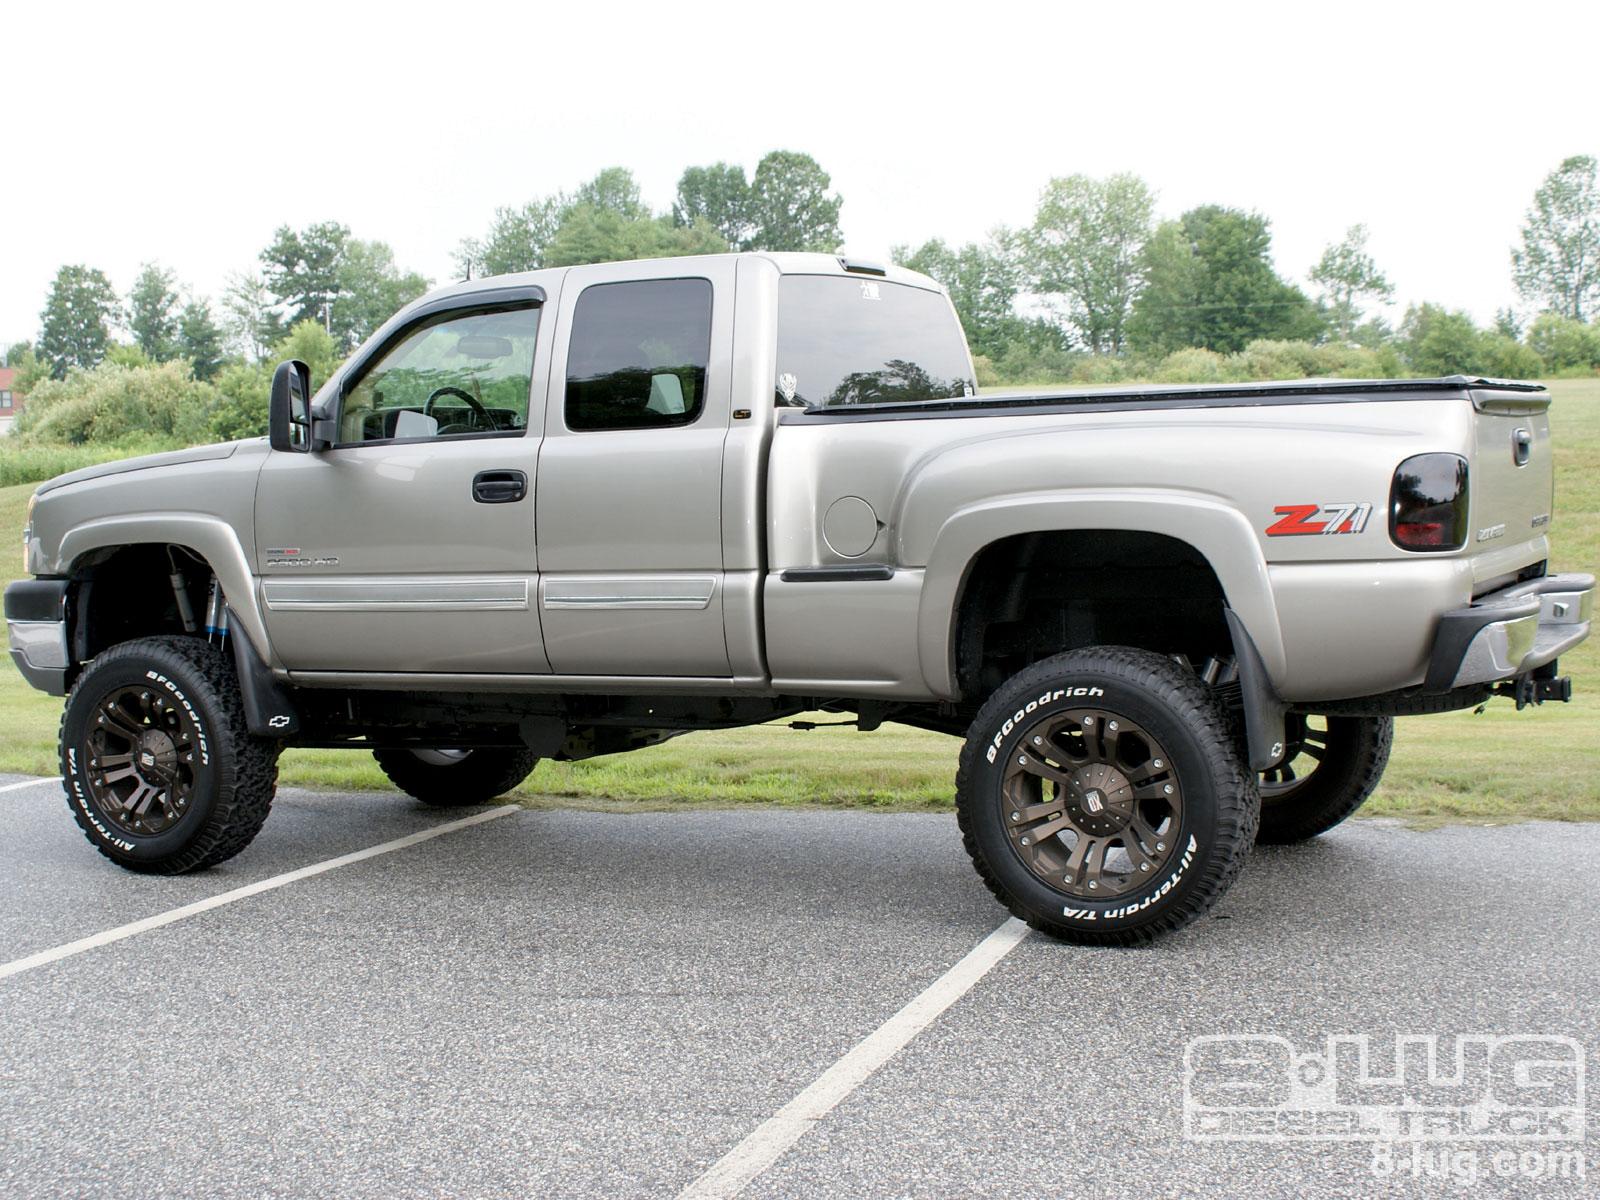 Lifted Chevy Truck Wallpaper 2004 chevrolet silverado 1600x1200